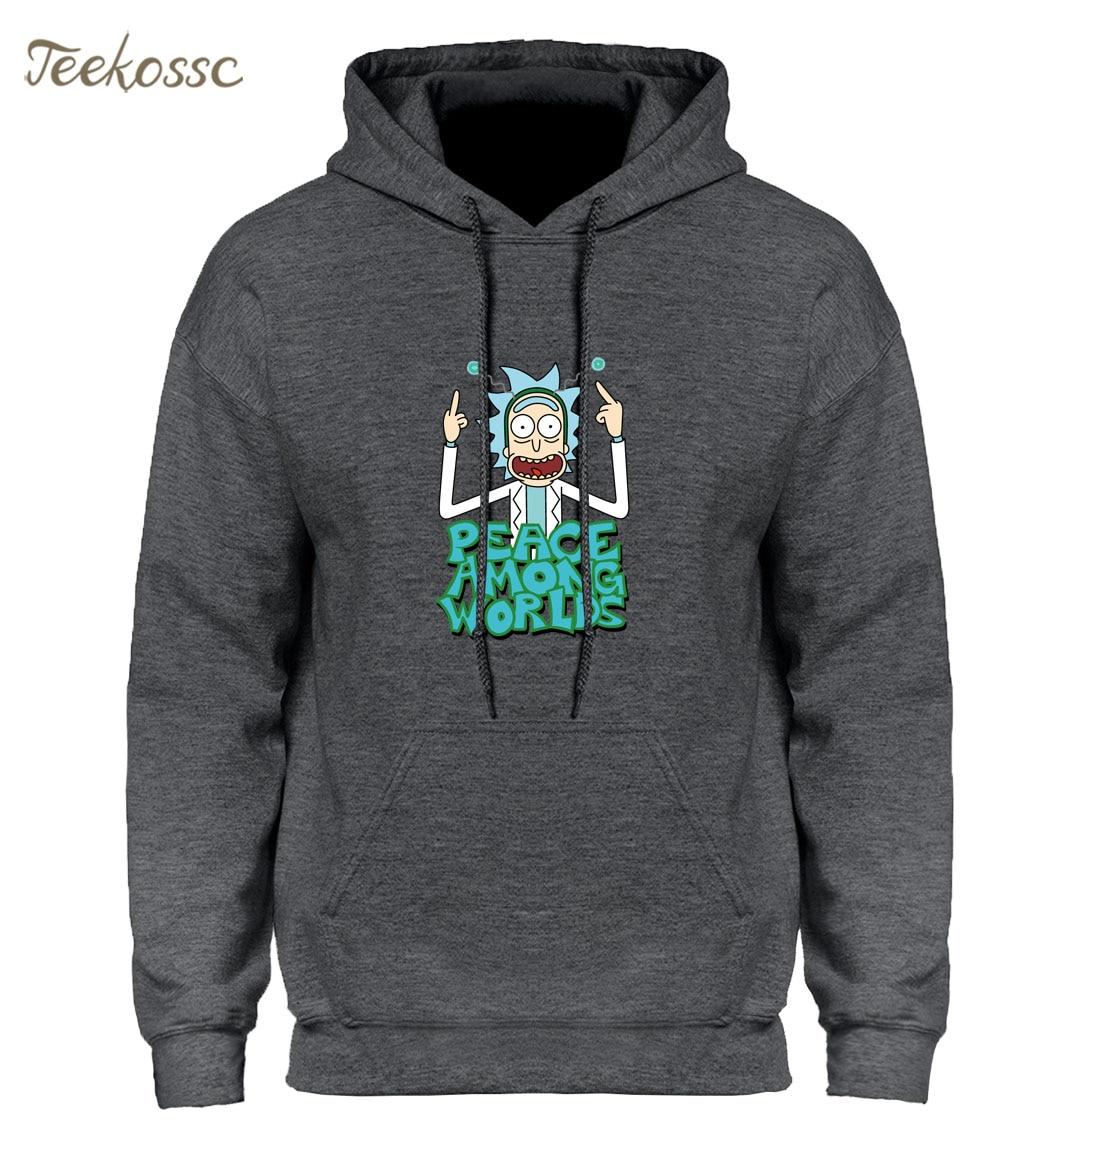 Rick And Morty Hoodie Men Peace Among Worlds Funny Hoodies Mens Fleece Warm Sweatshirts Male Cartoon White Hooded Sweatshirt